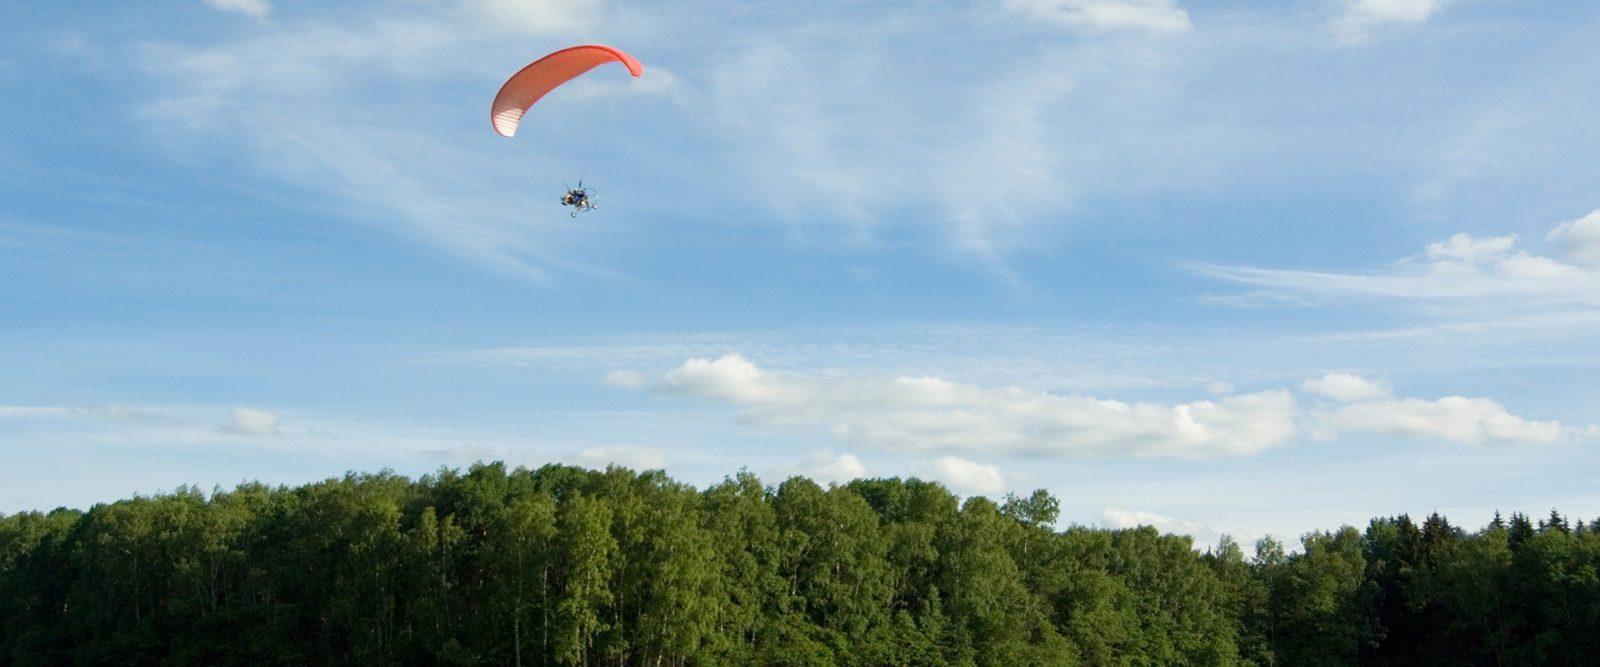 Powered parachute flight in Israel